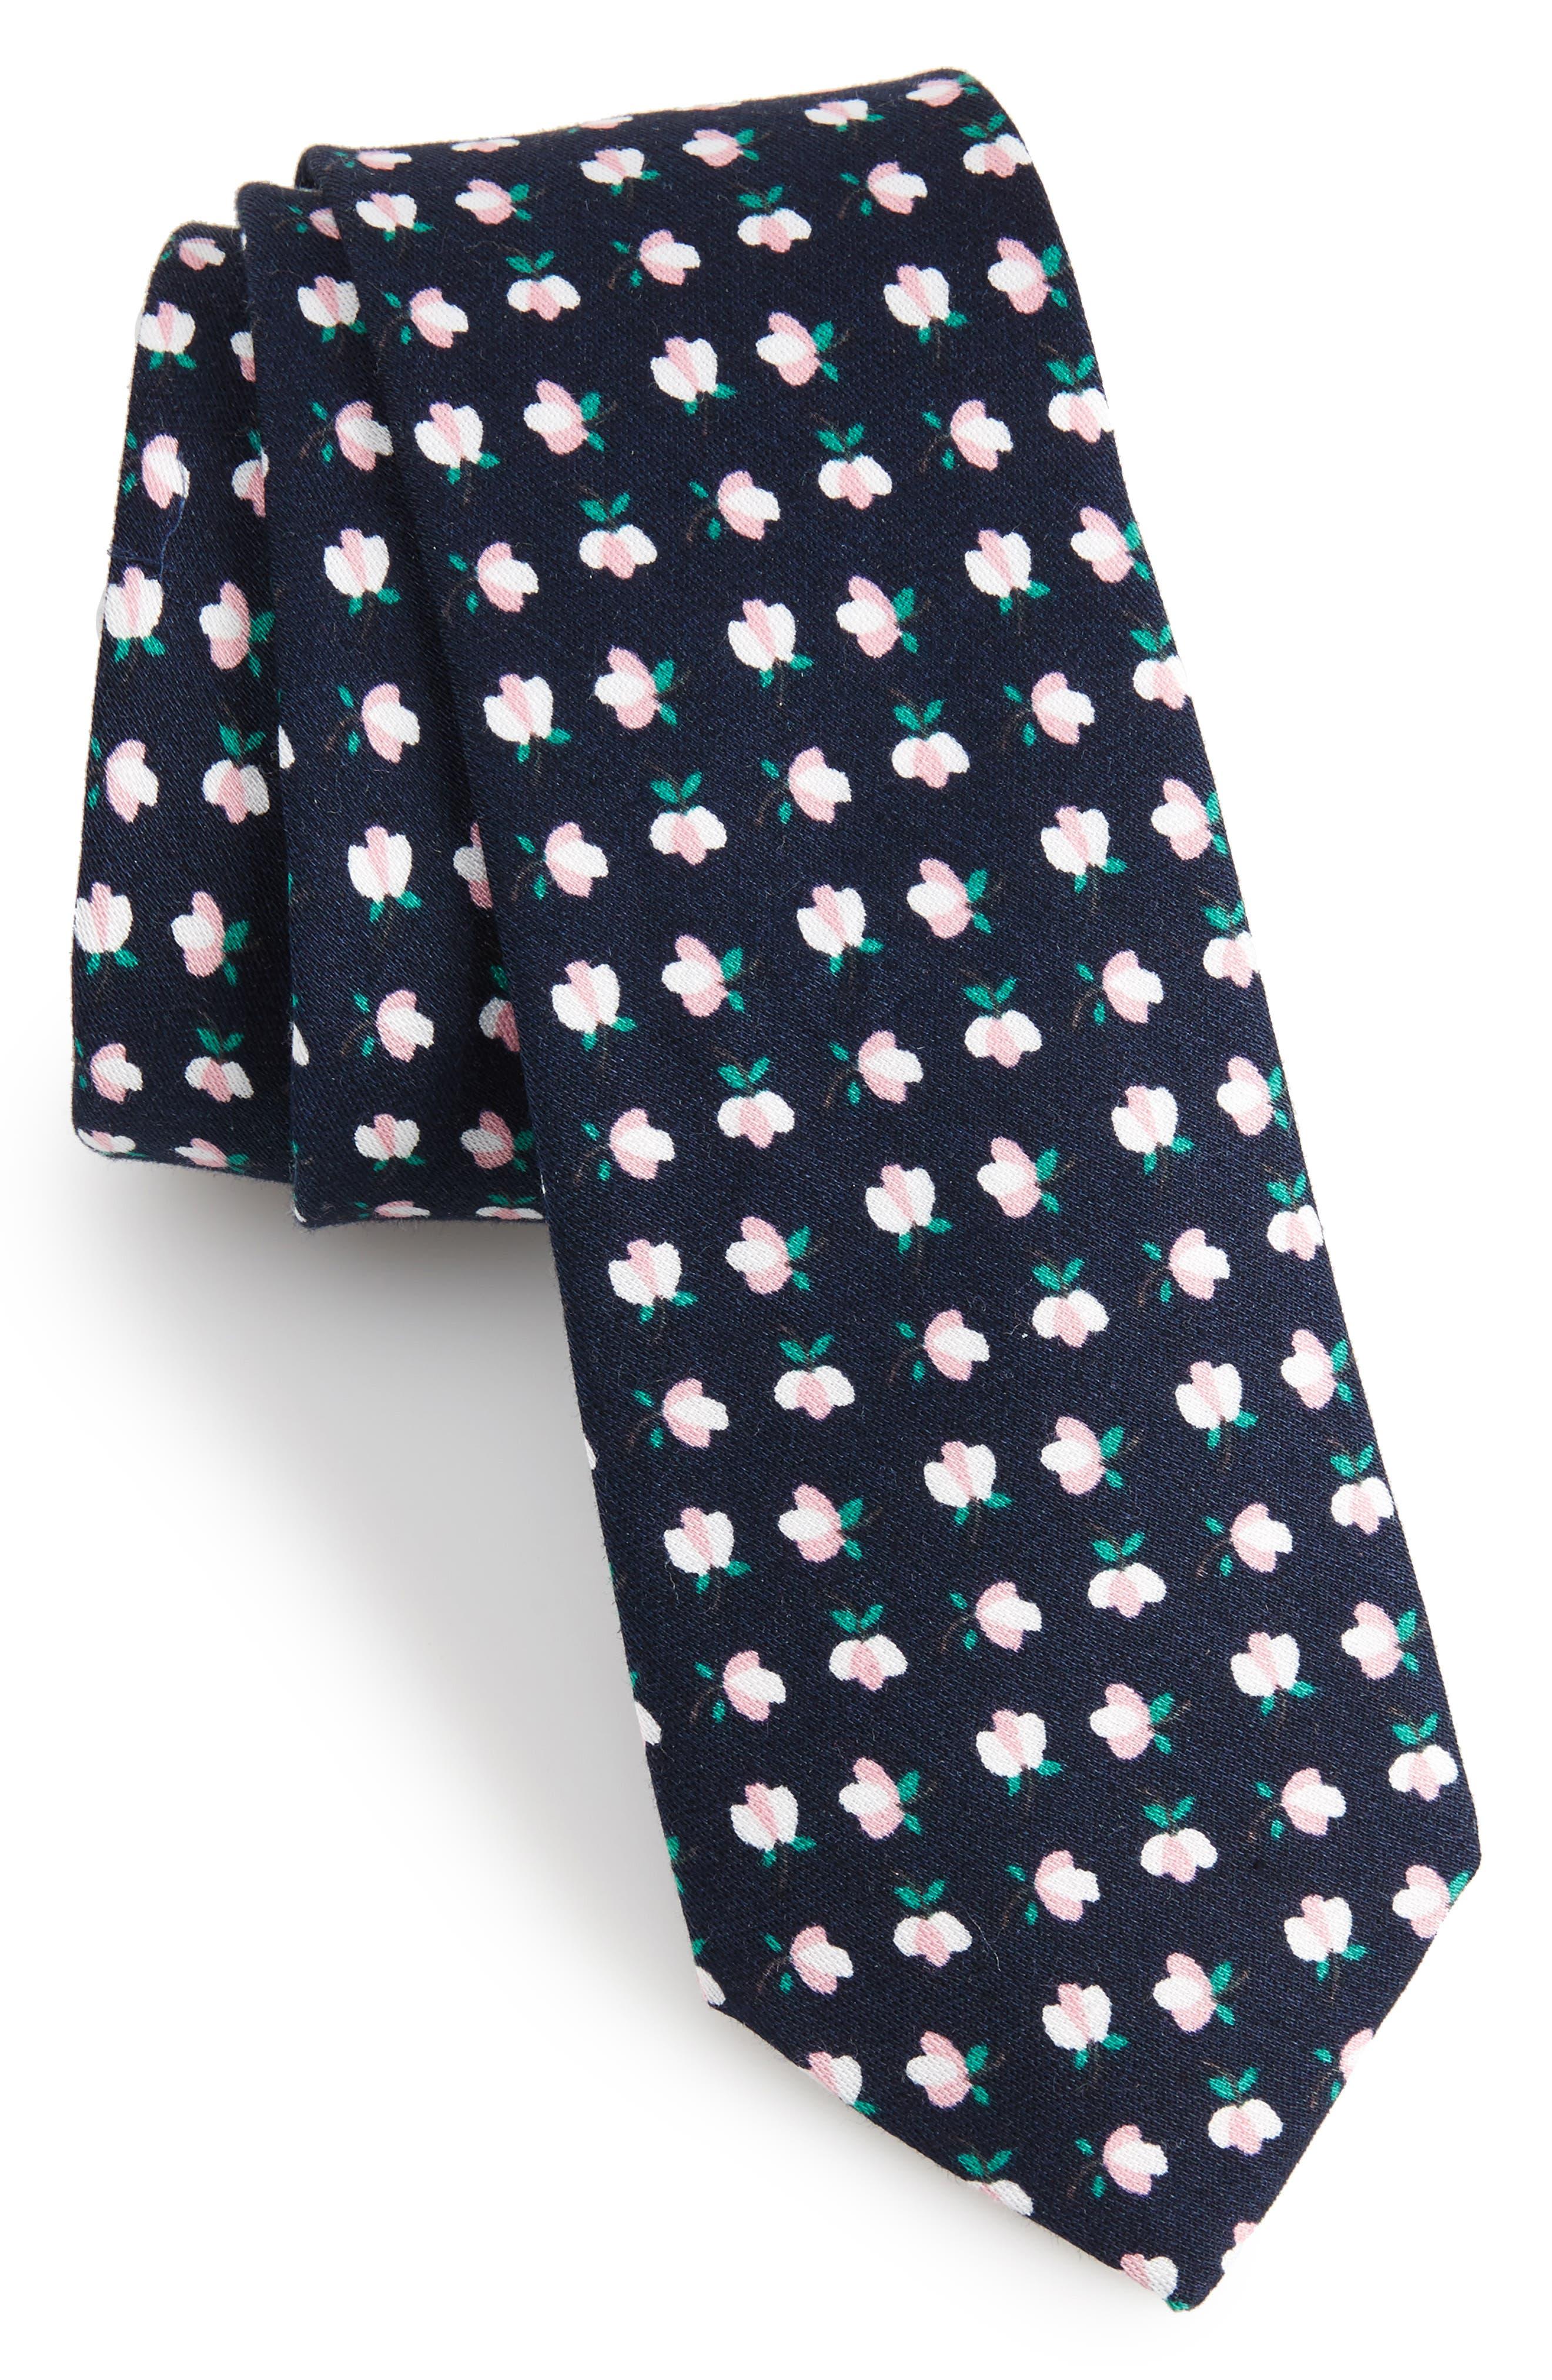 Rufford Mini Floral Cotton Tie,                         Main,                         color, Navy